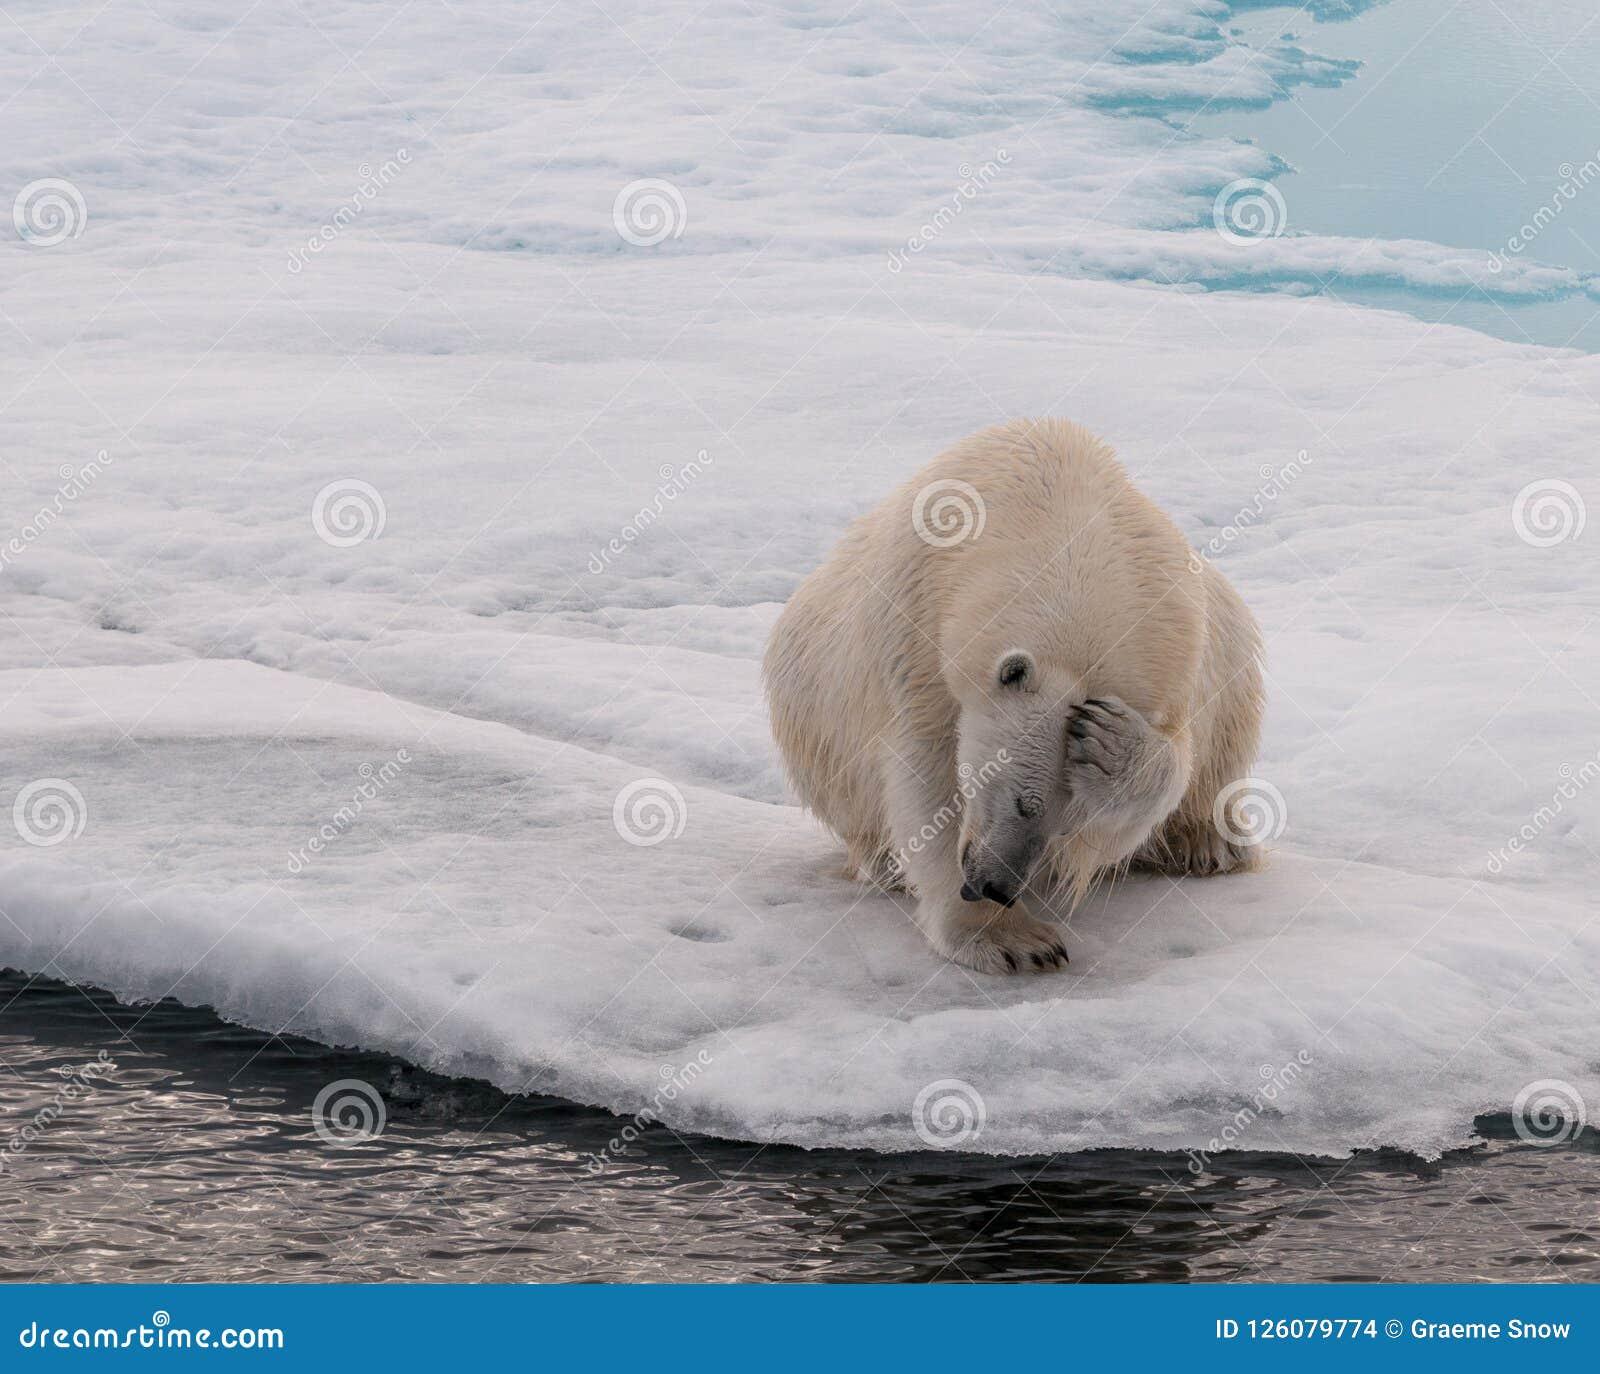 Adult Polar Bear scratching its head, on sea-ice, Svalbard